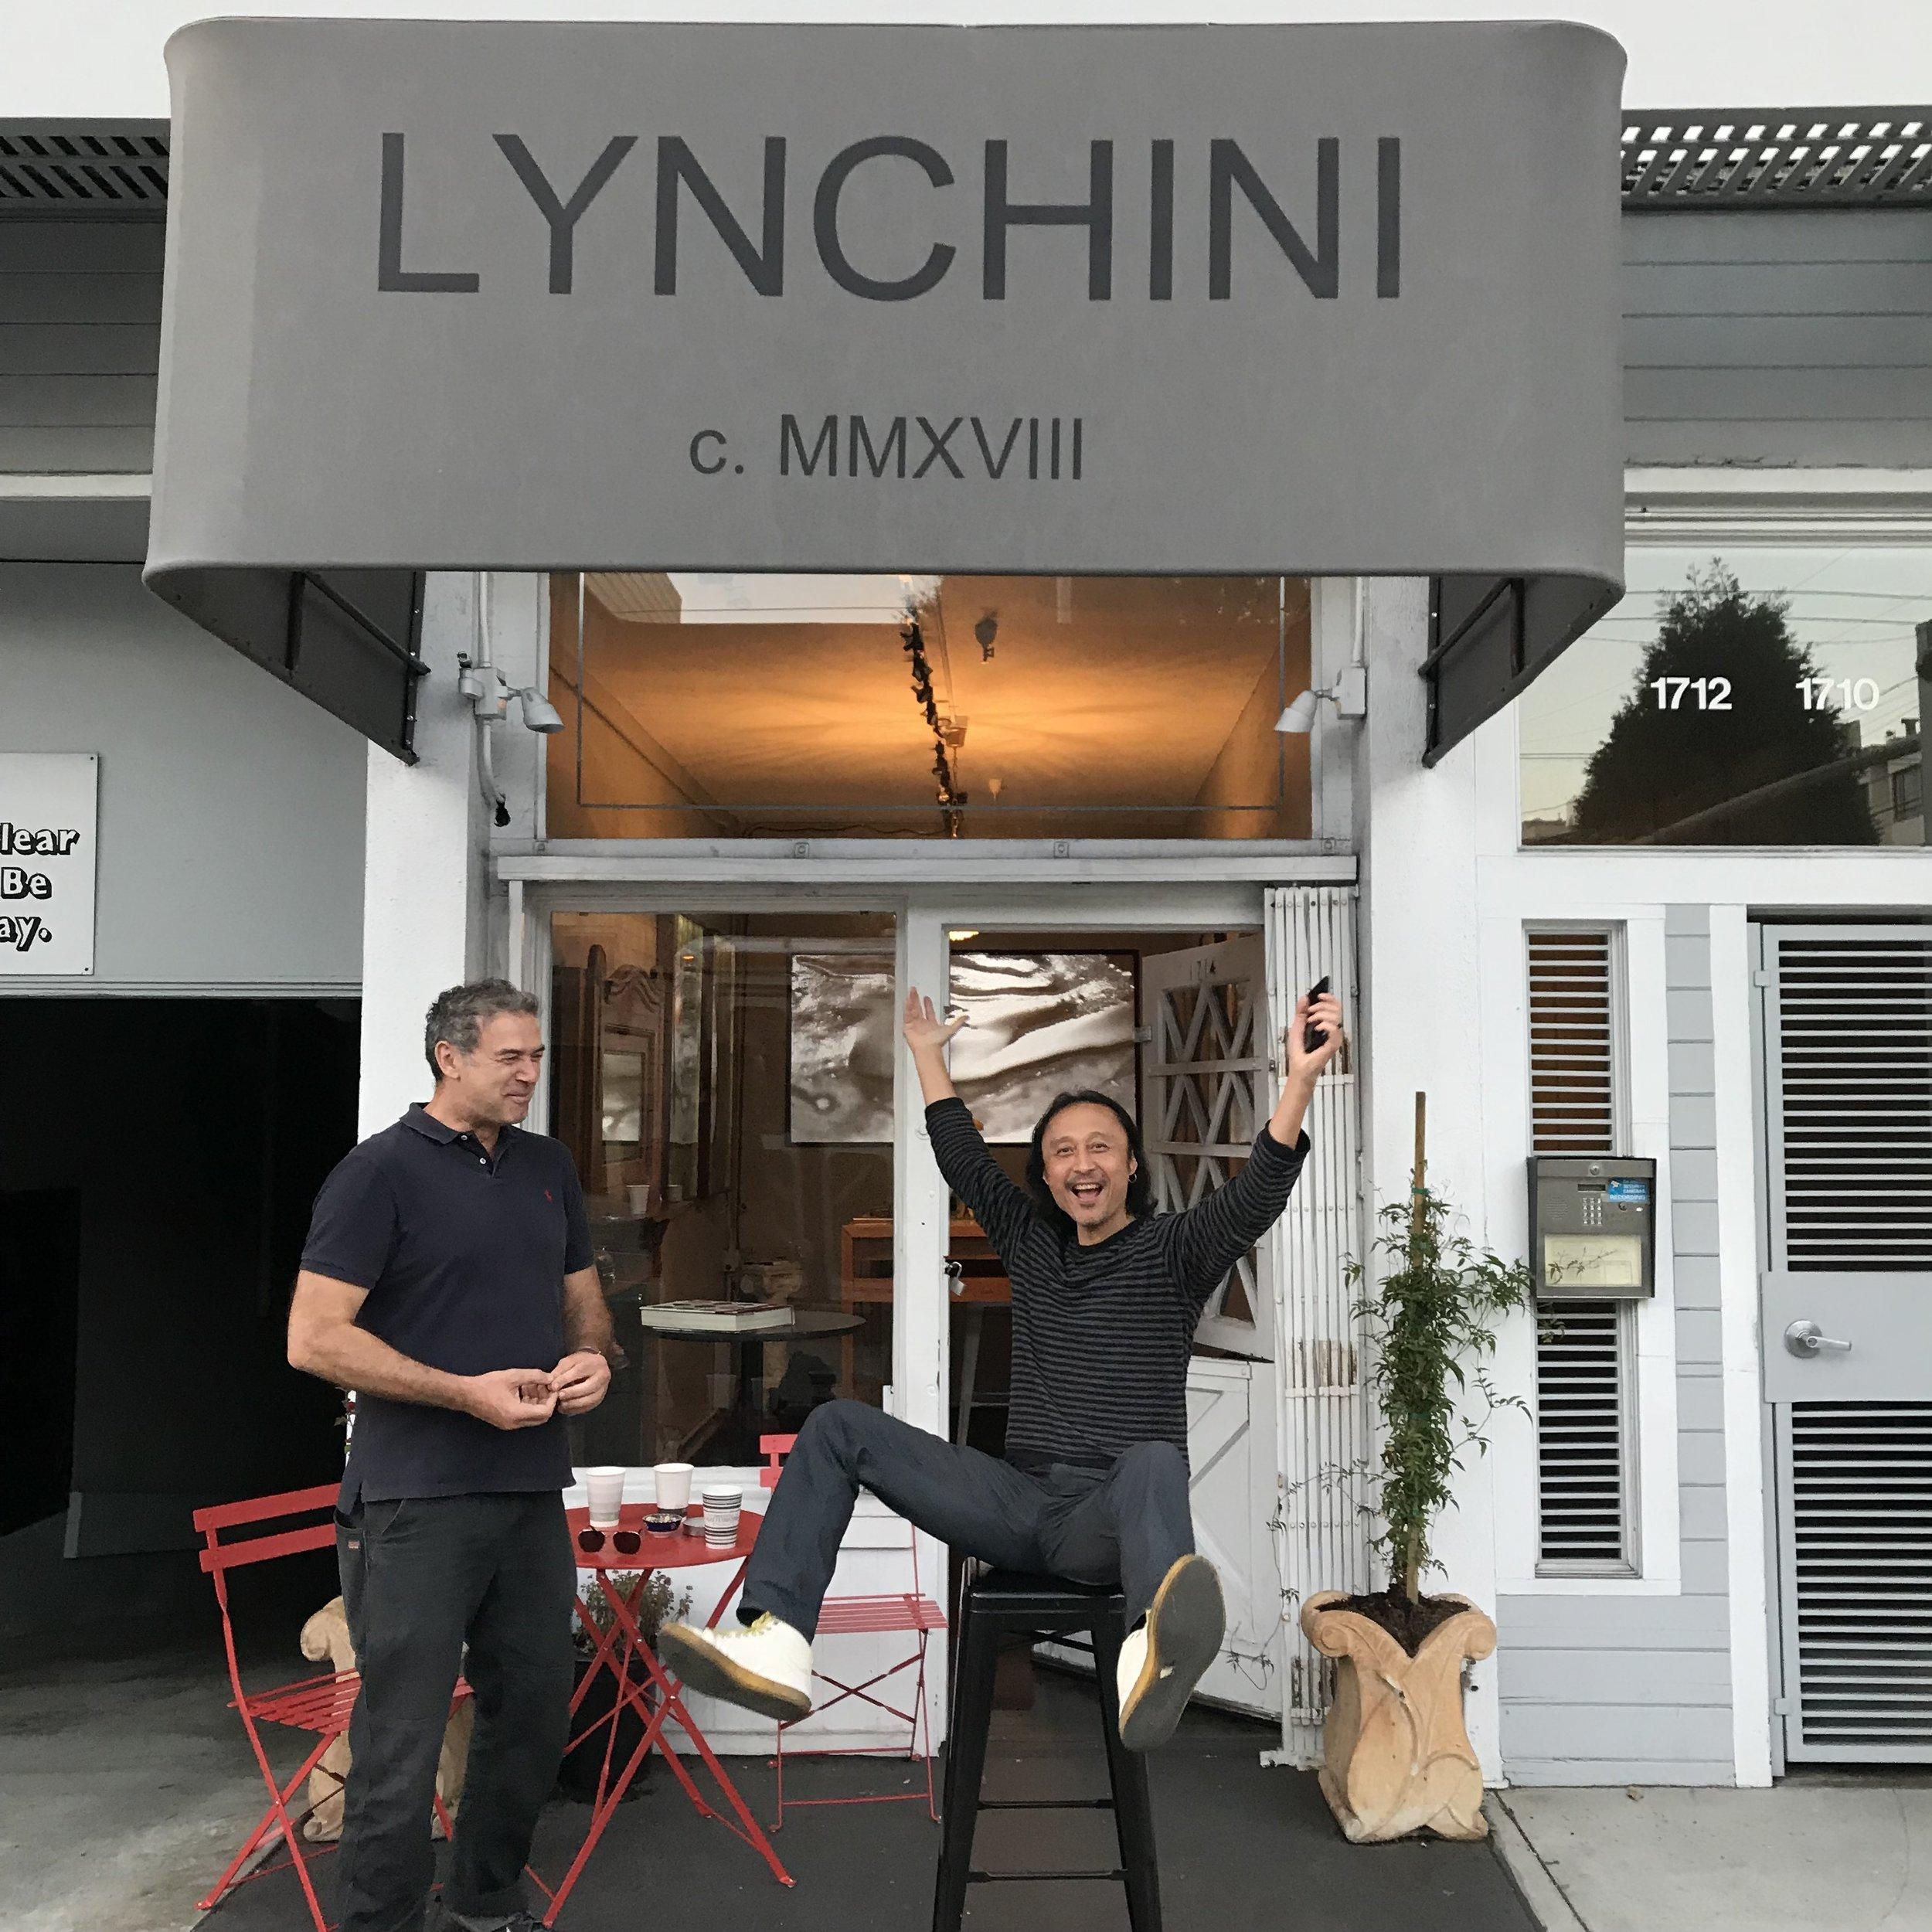 lynchini_2.jpg